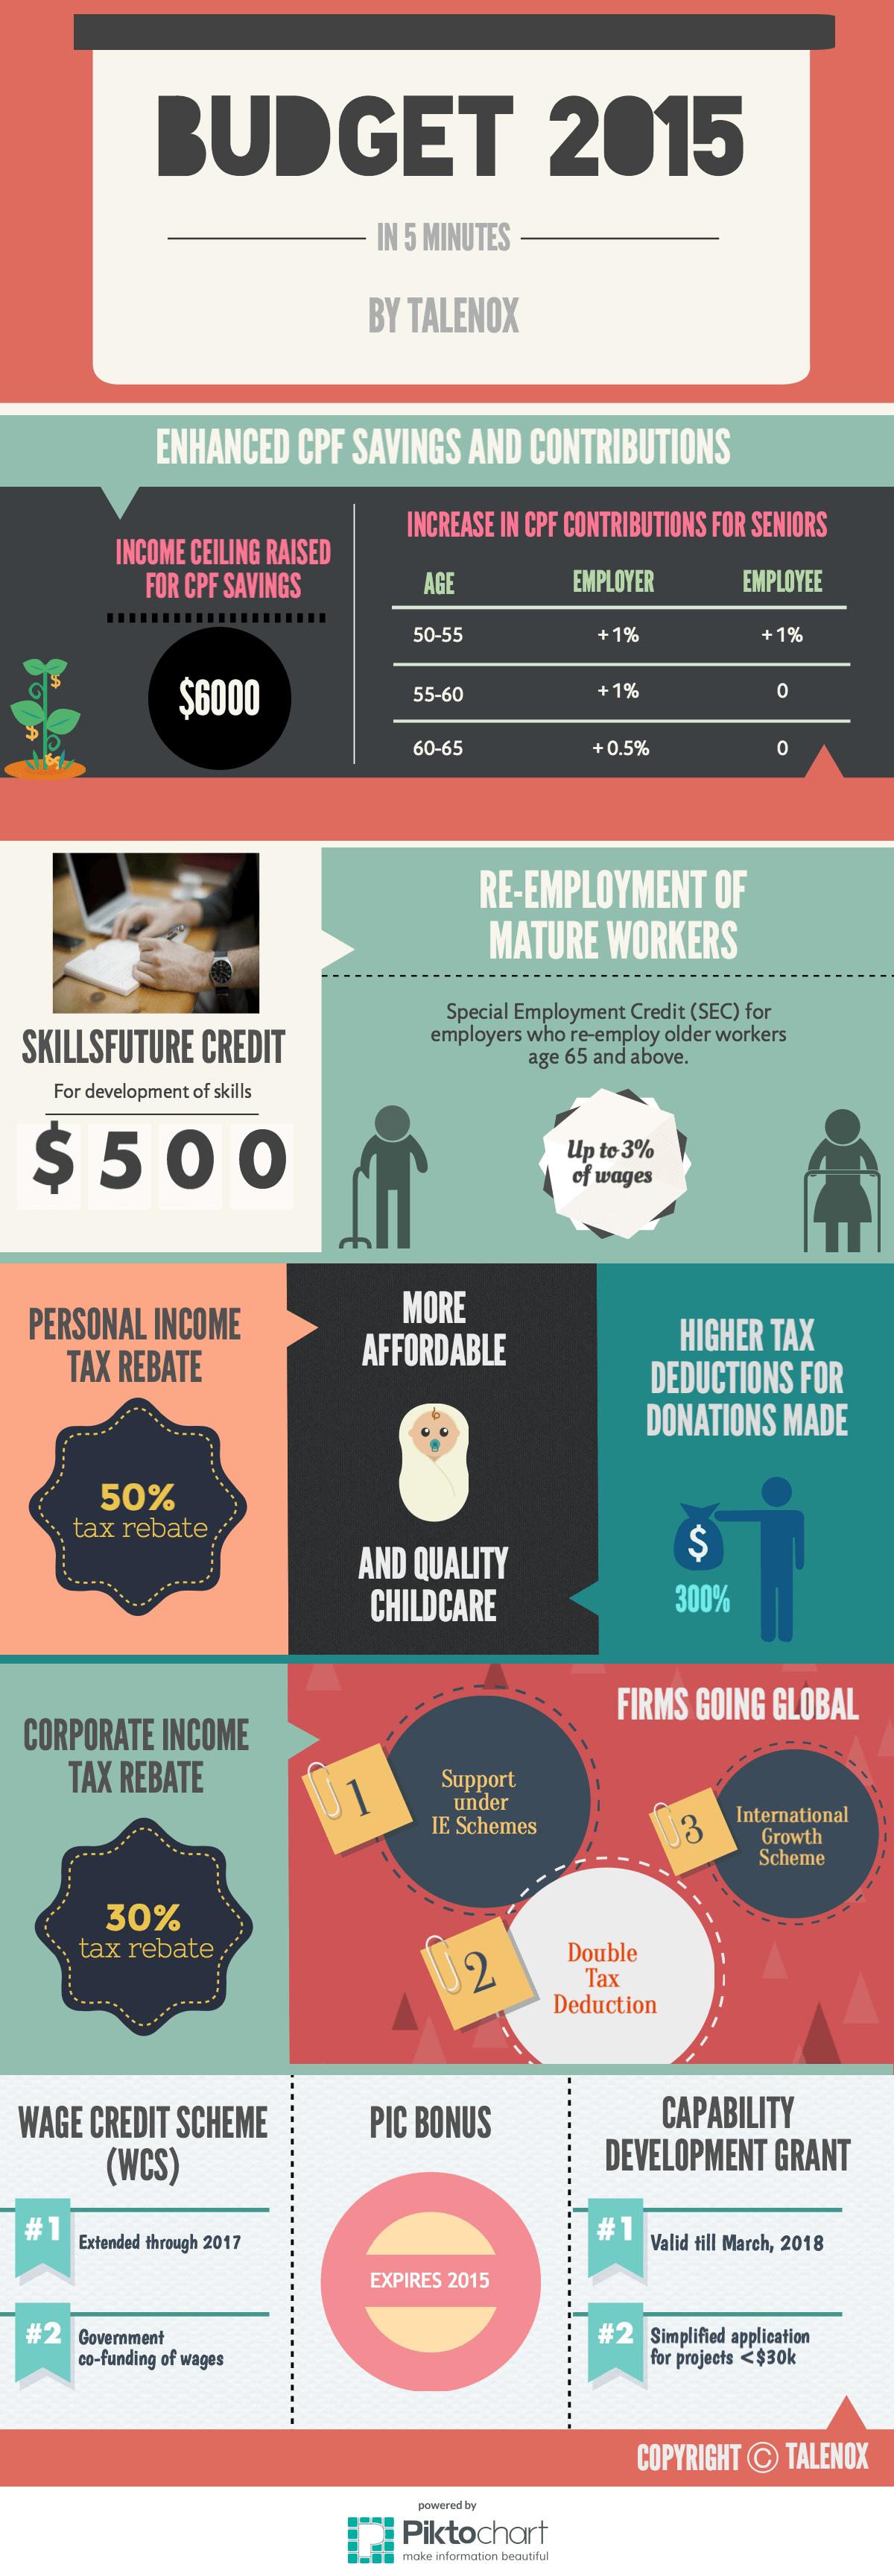 Singapore Budget 2015 Infographic